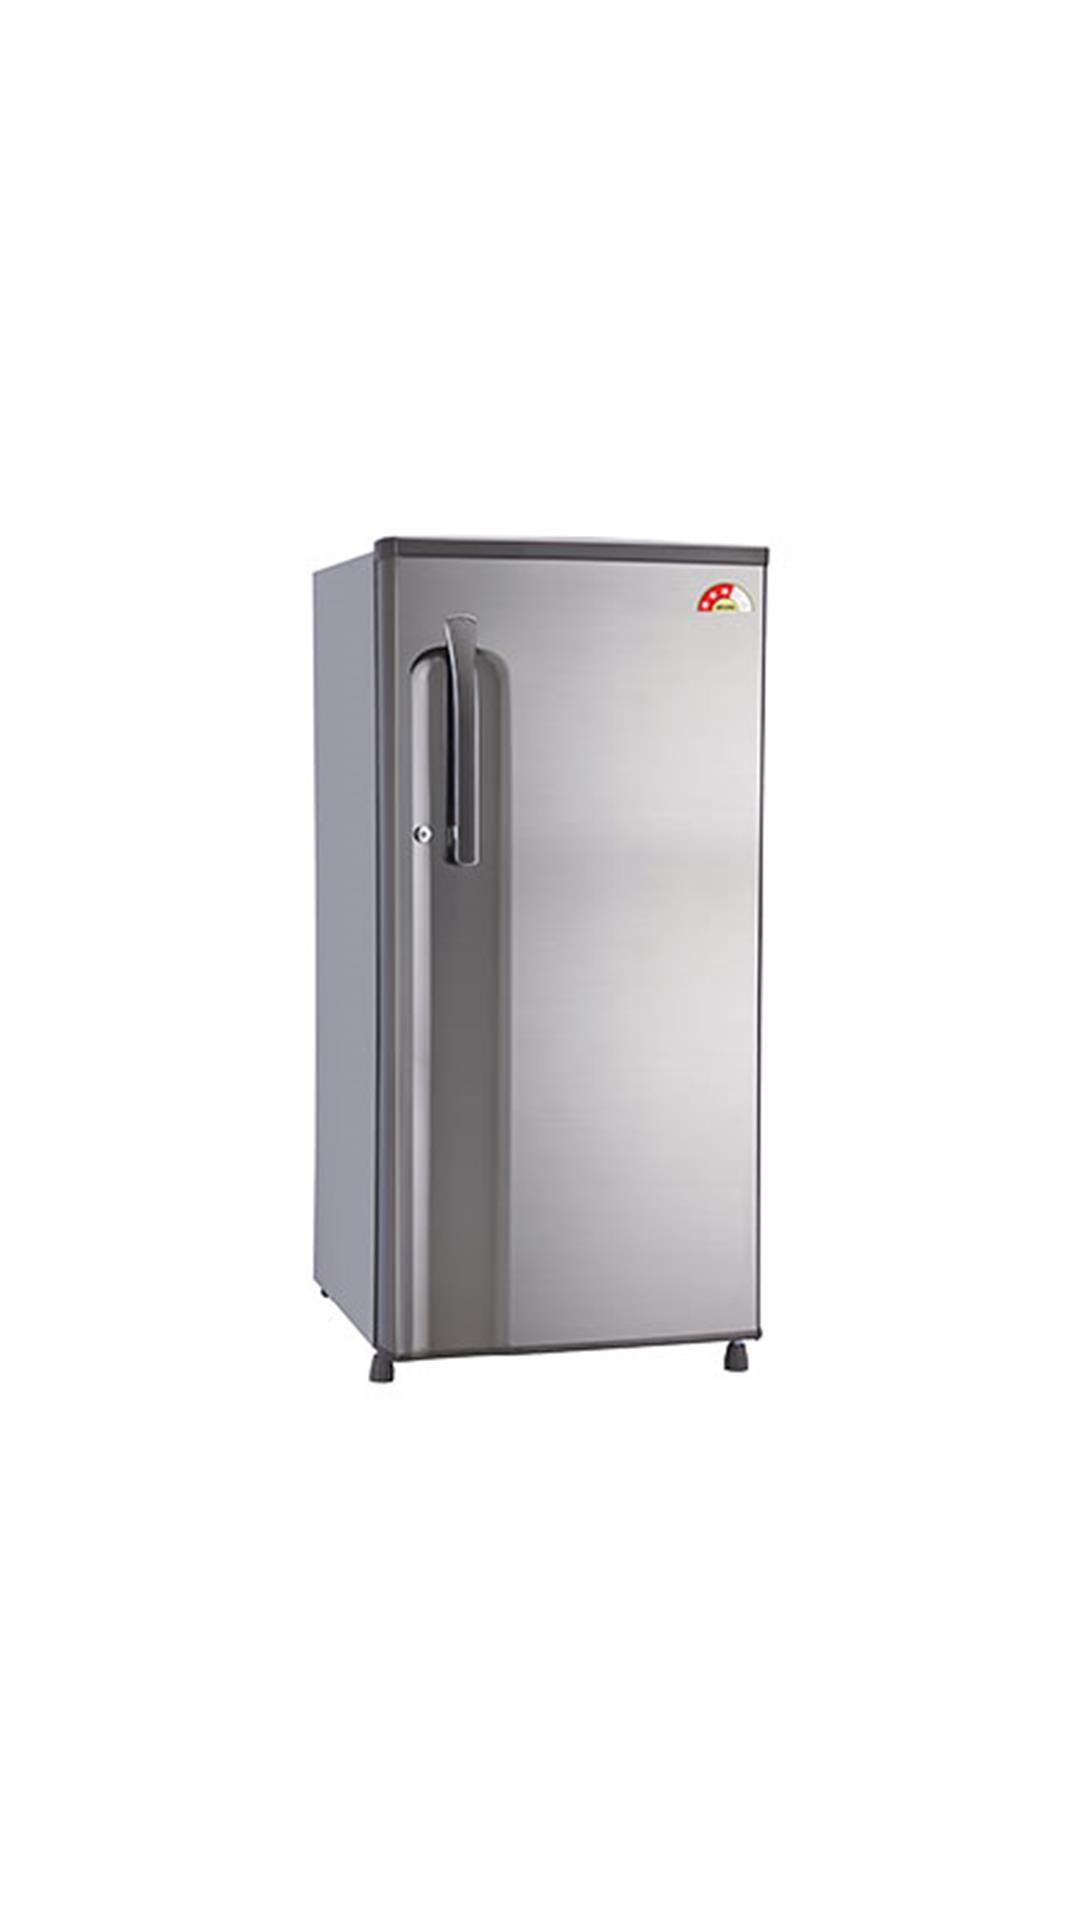 LG 188 L Single Door Refrigerator Shiny Steel (GL-B191KPZQ)